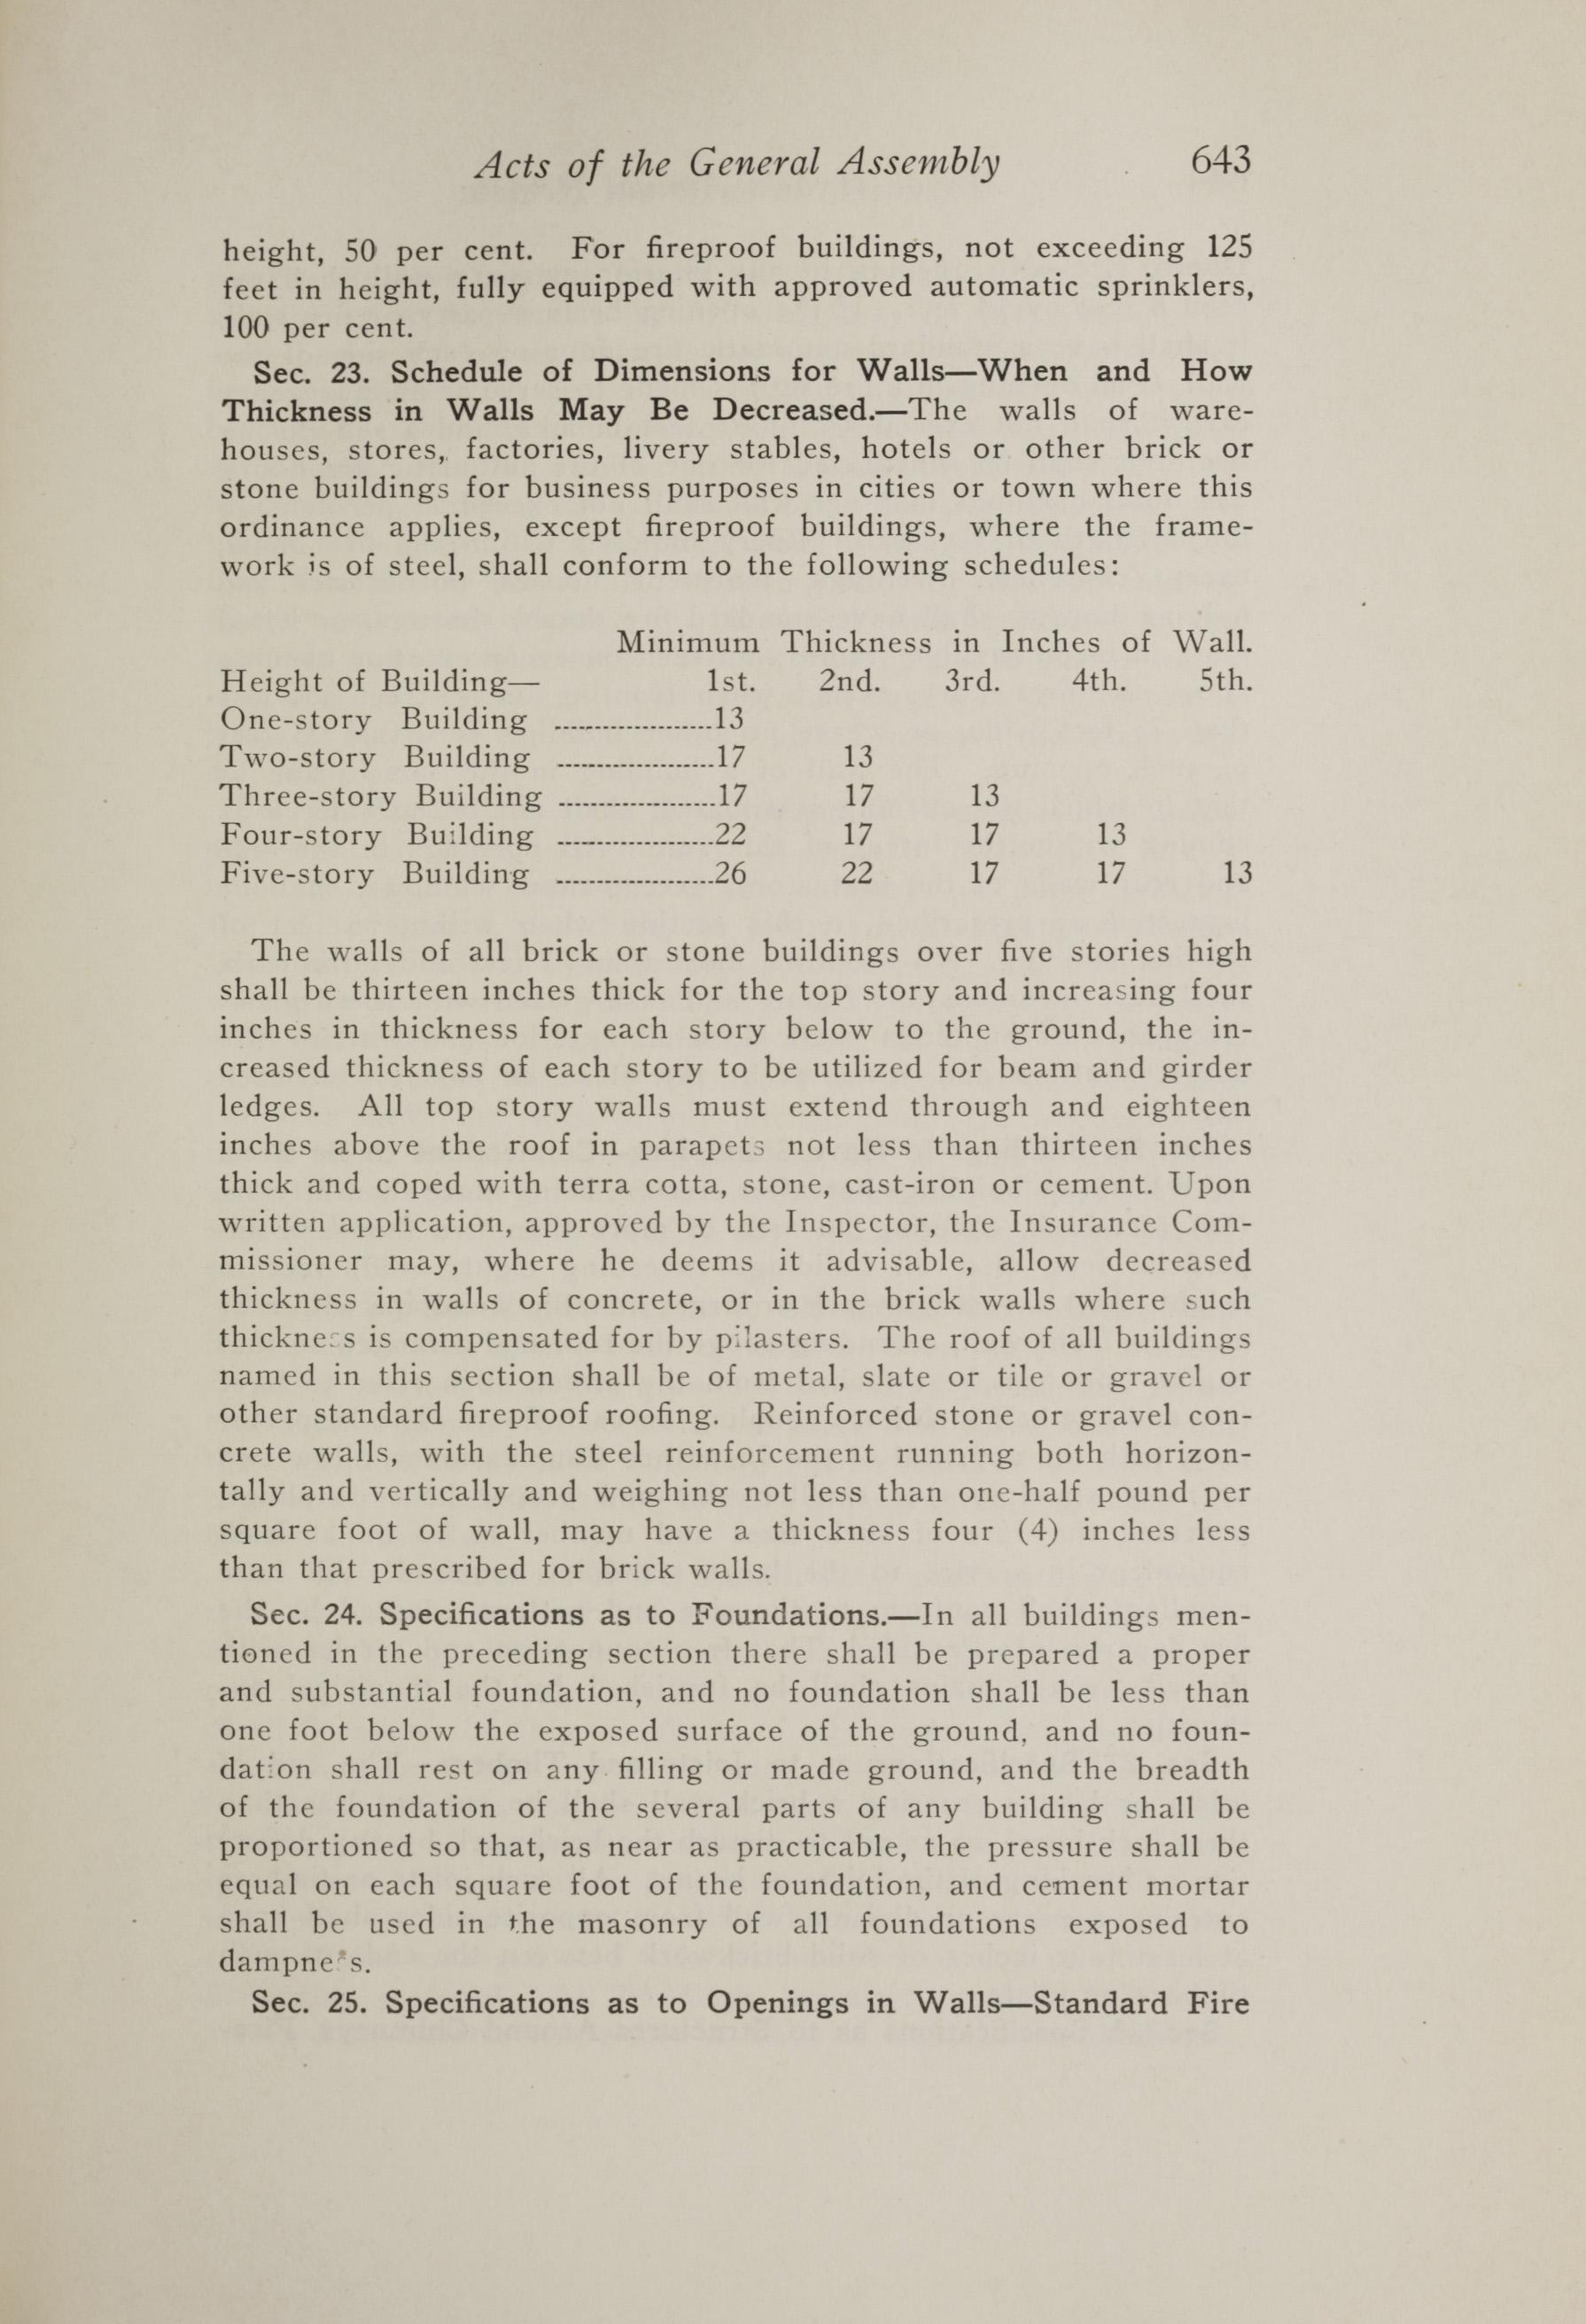 Charleston Yearbook, 1917, page 643